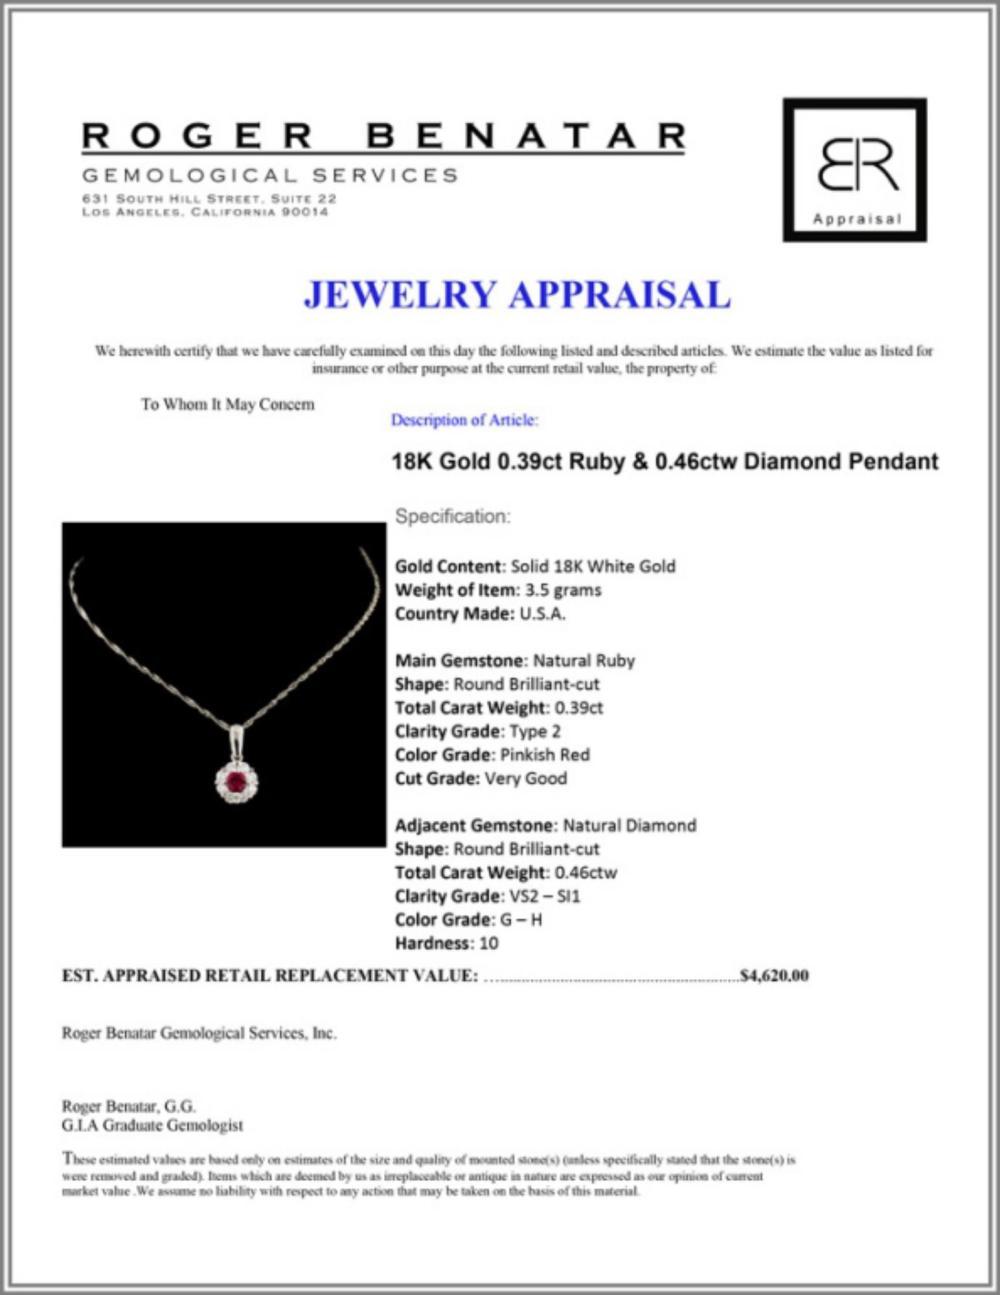 Lot 146: 18K Gold 0.39ct Ruby & 0.46ctw Diamond Pendant